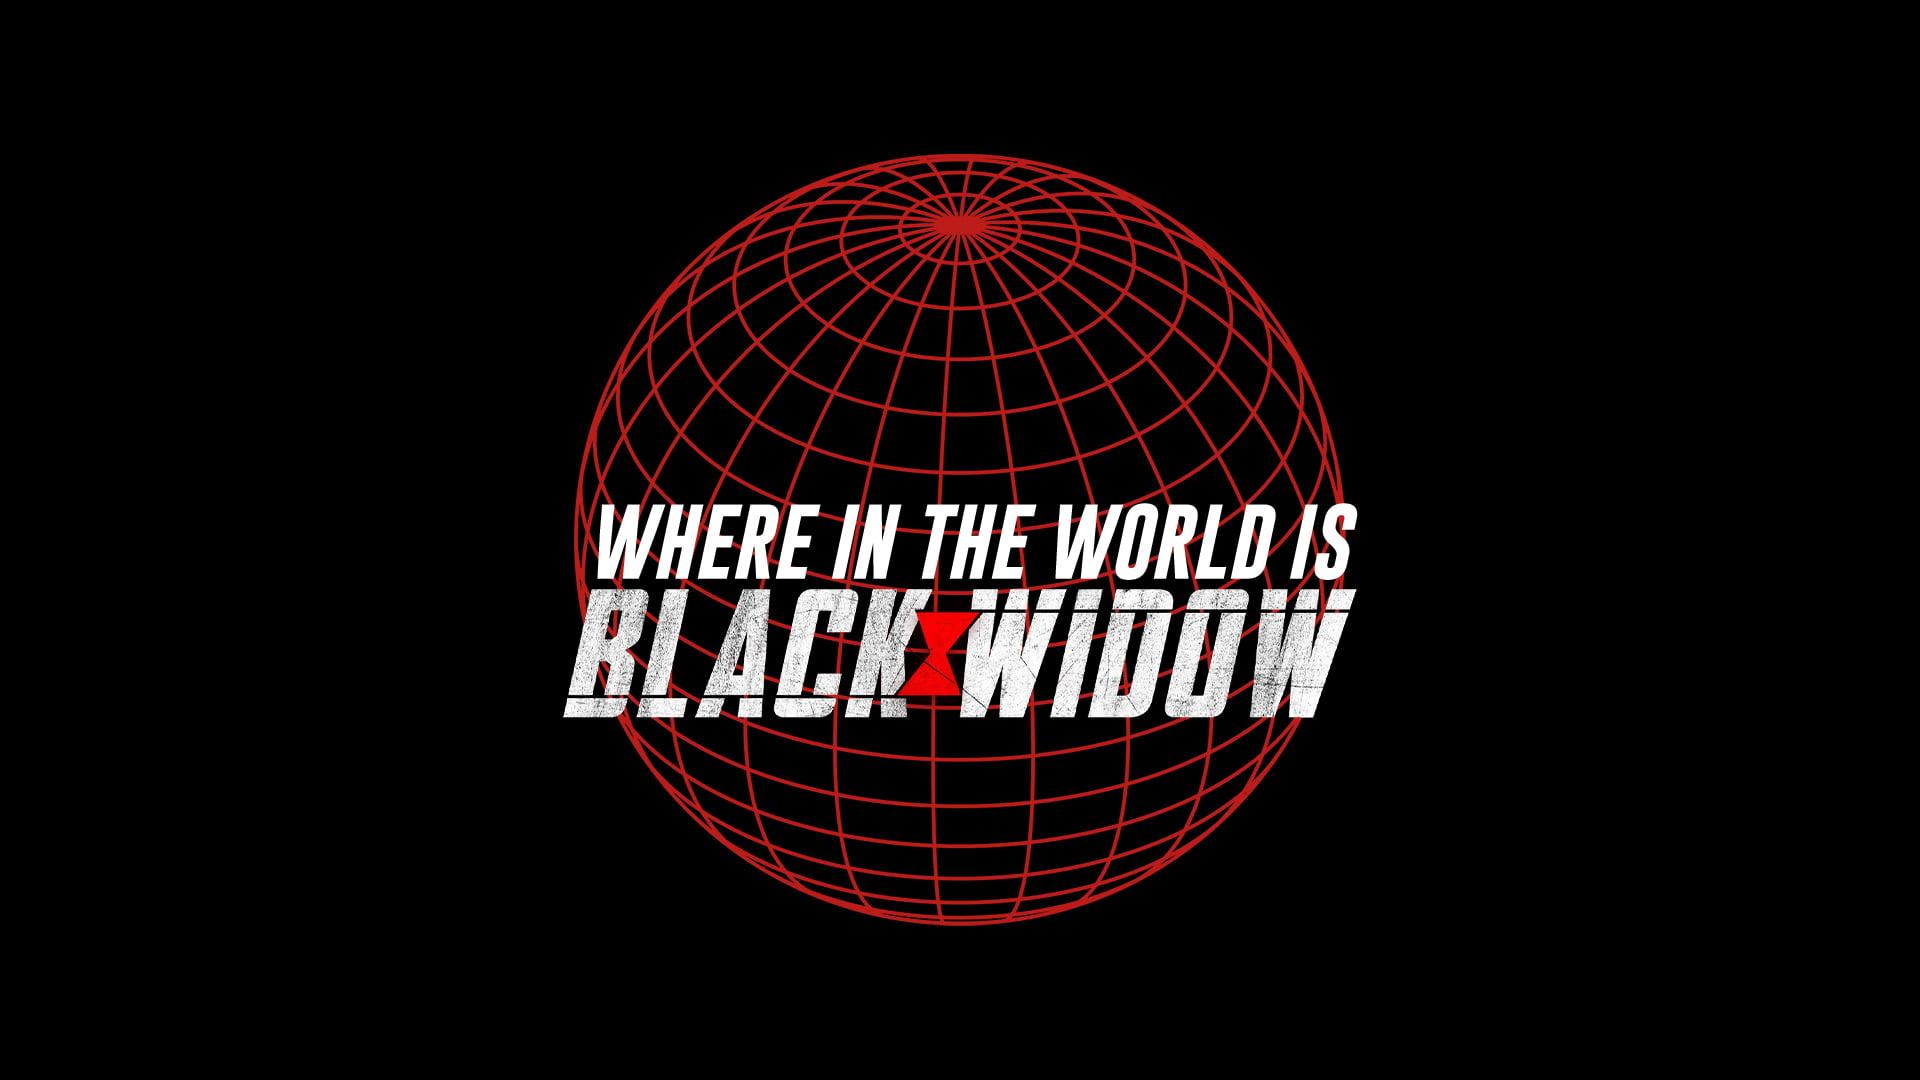 black_widow__2020__wallpaper__3_by_mintmovi3_ddoannh (1) copy